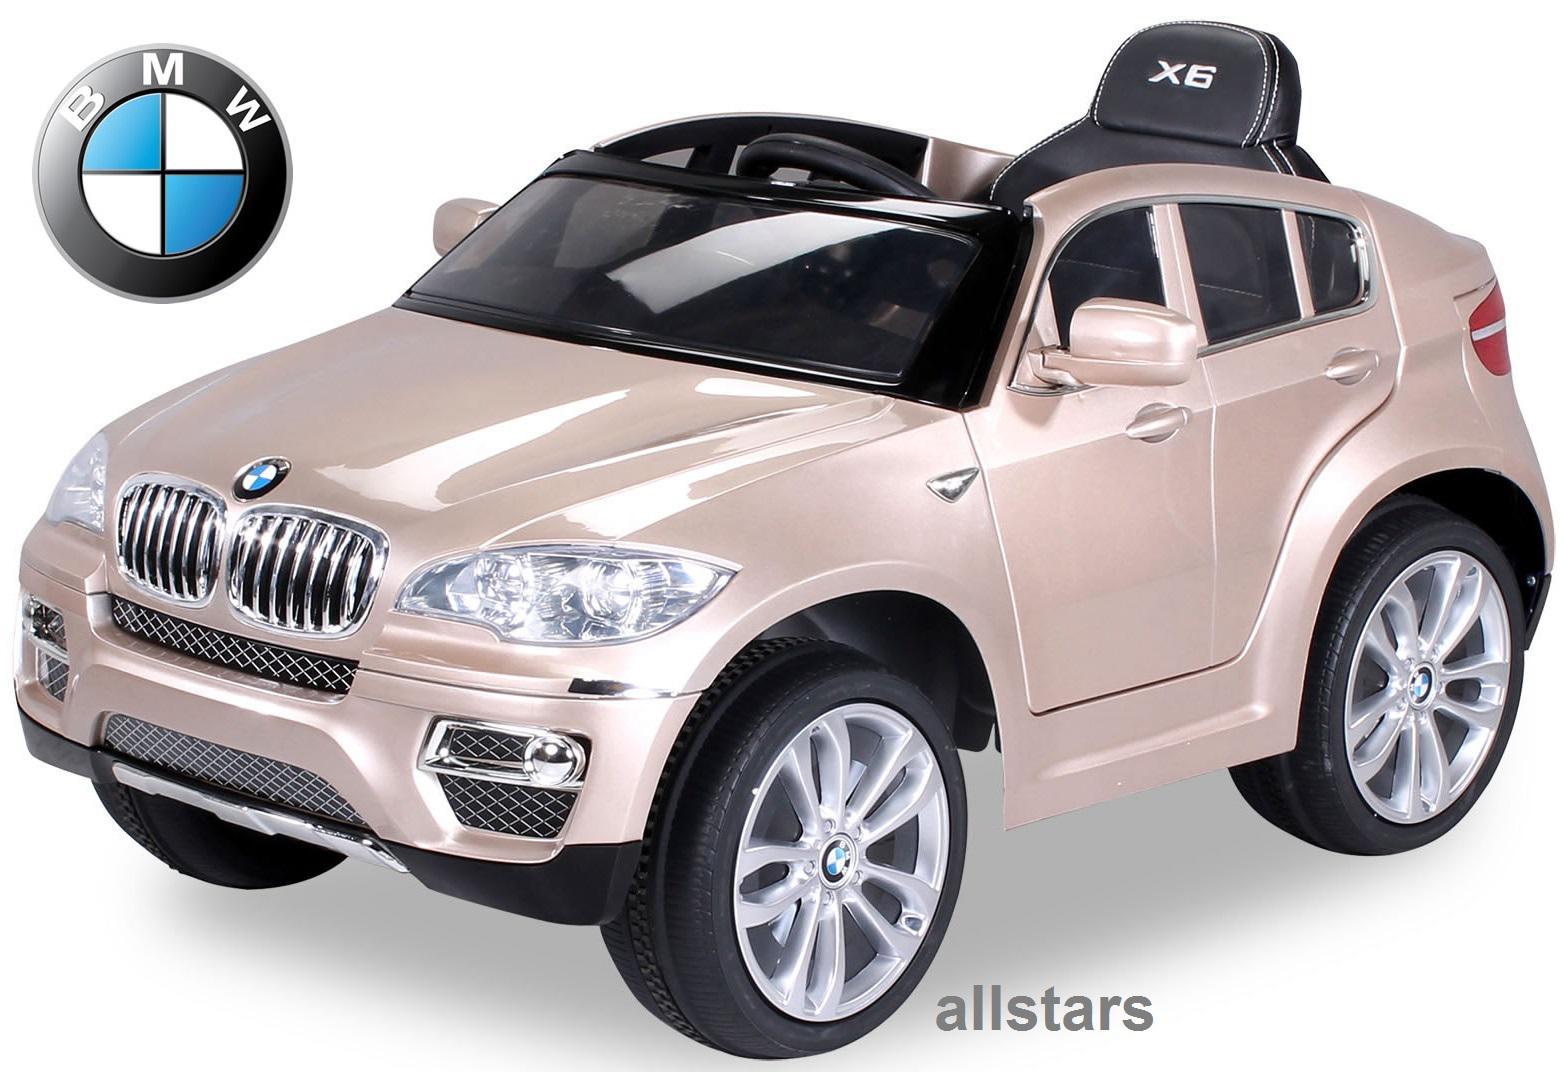 elektro kinderauto bmw x6 lizenziert e auto 90 w. Black Bedroom Furniture Sets. Home Design Ideas